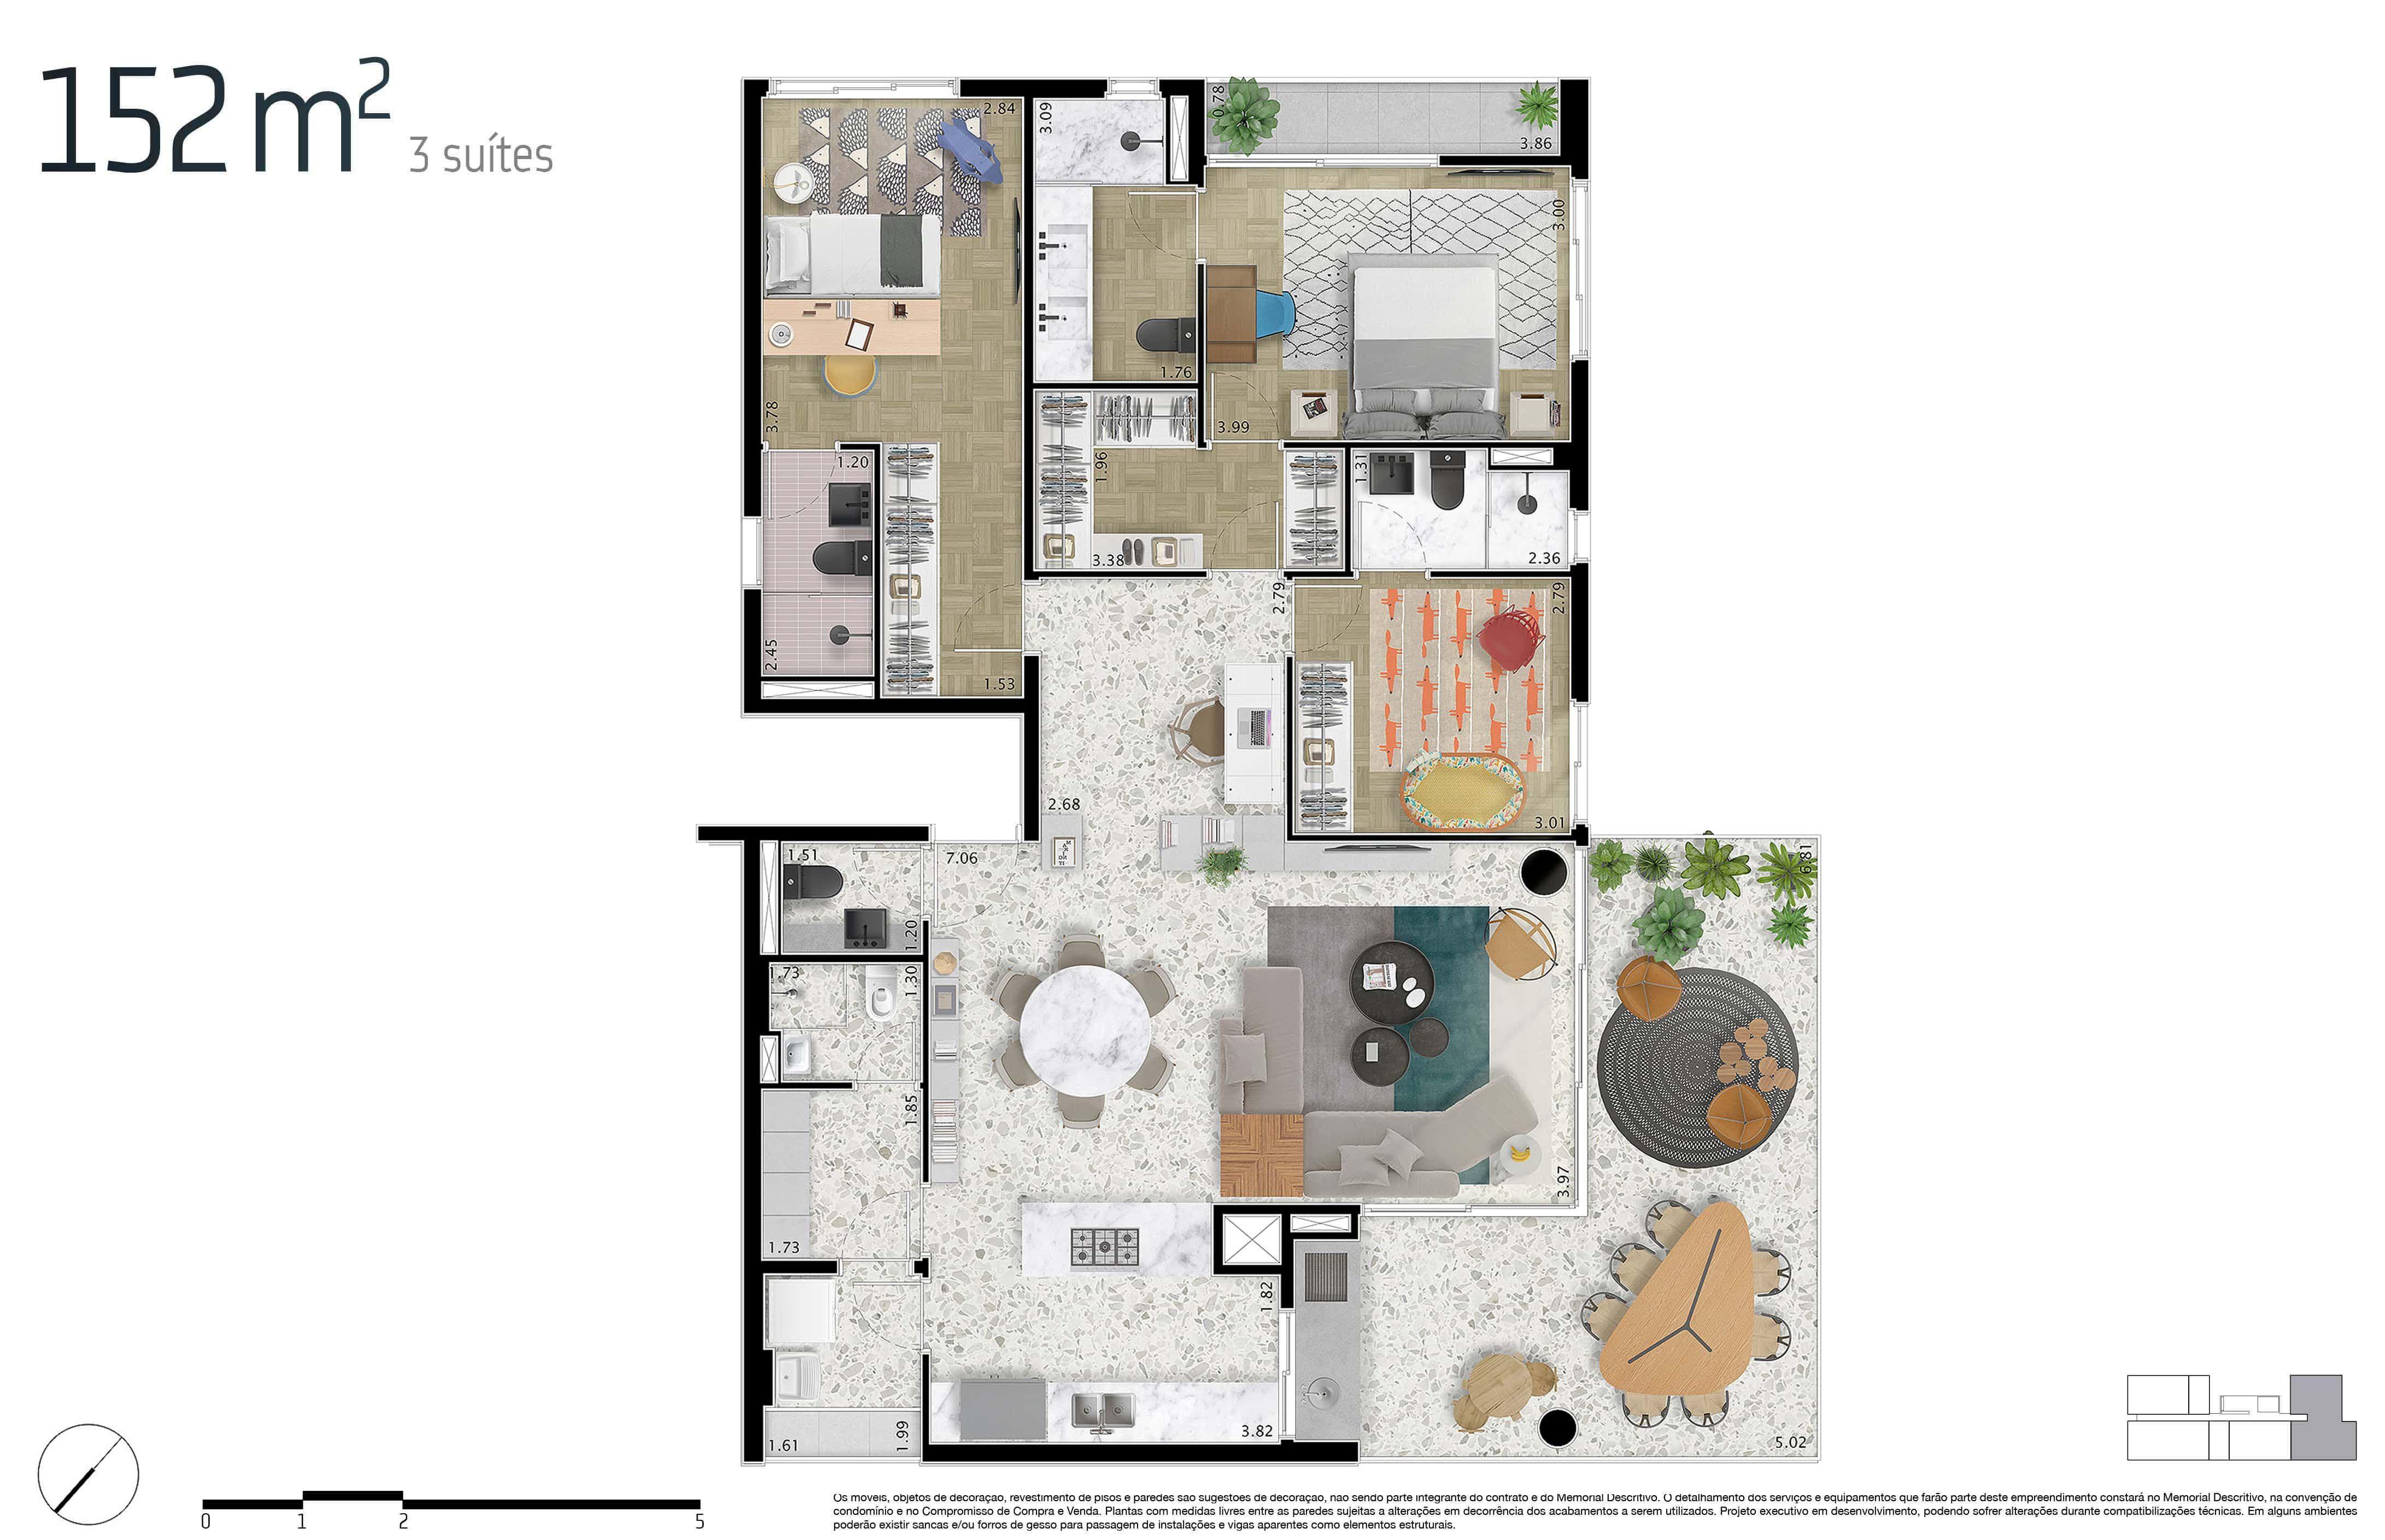 Spot 393 Idea Zarvos Projectos De Casas Idea Zarvos Planta Baixa